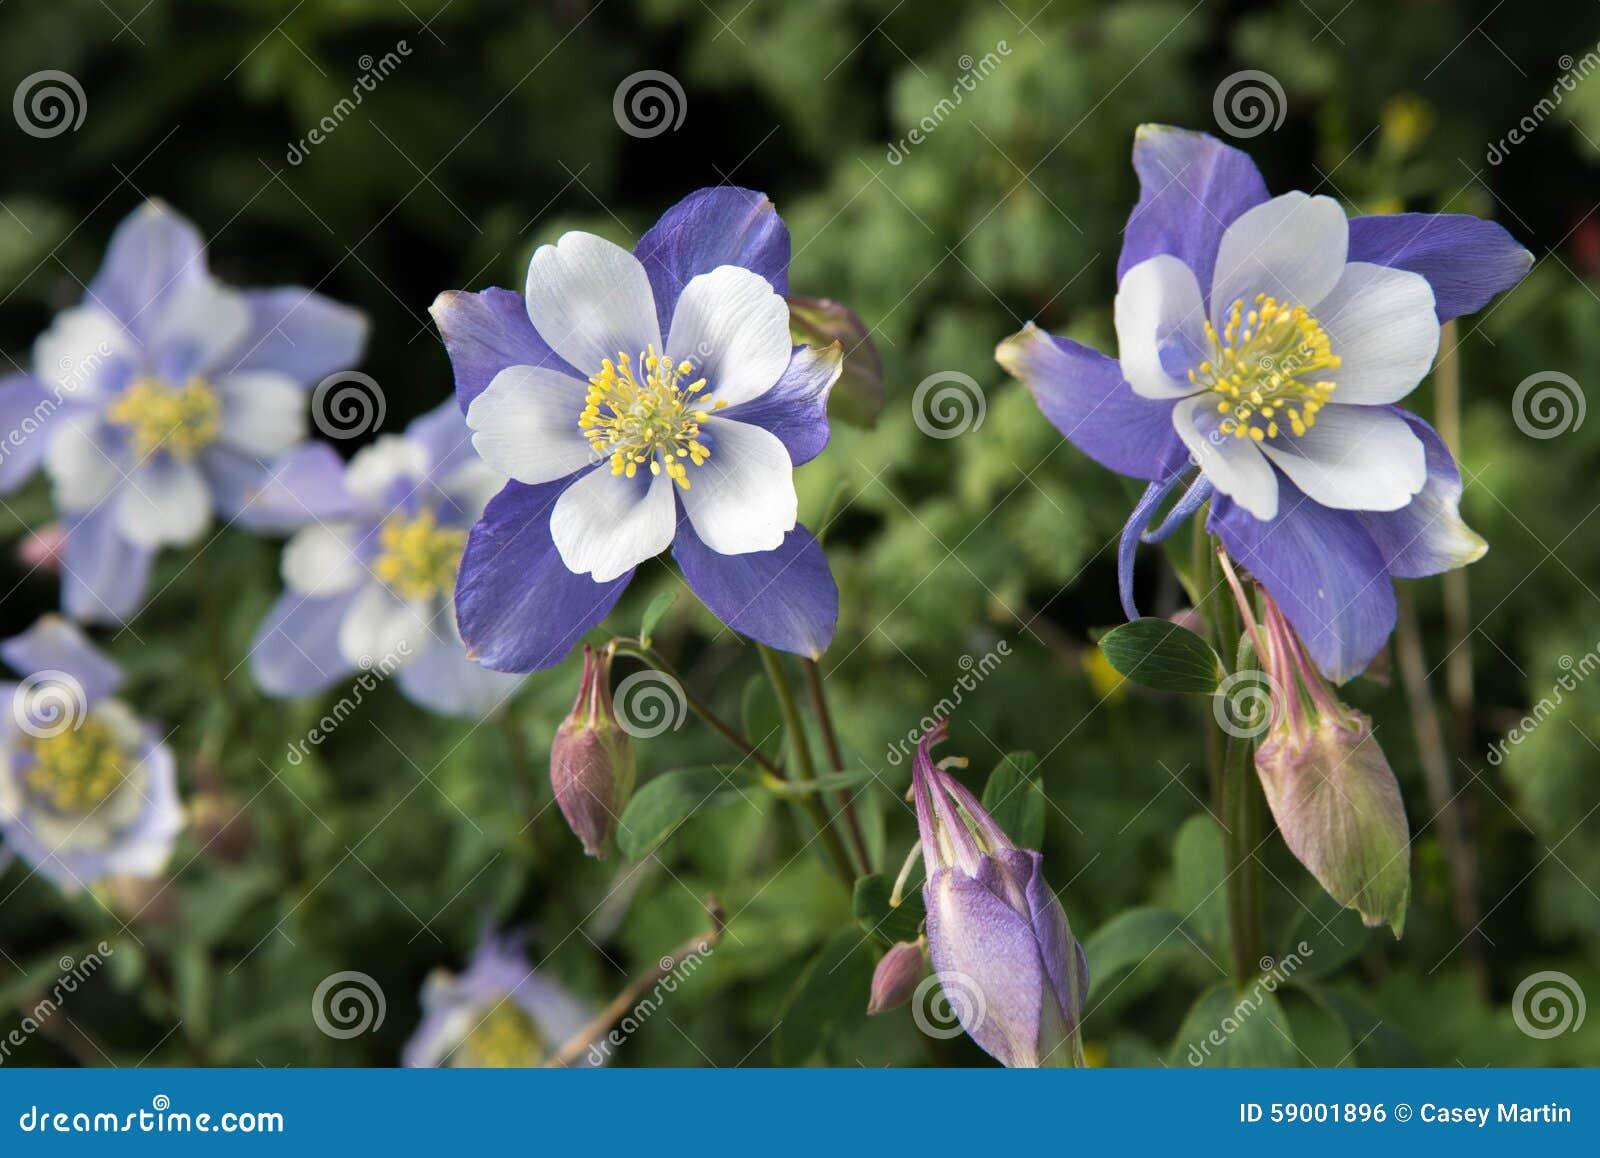 Field with rocky mountain blue columbine flowers stock photo image royalty free stock photo izmirmasajfo Gallery